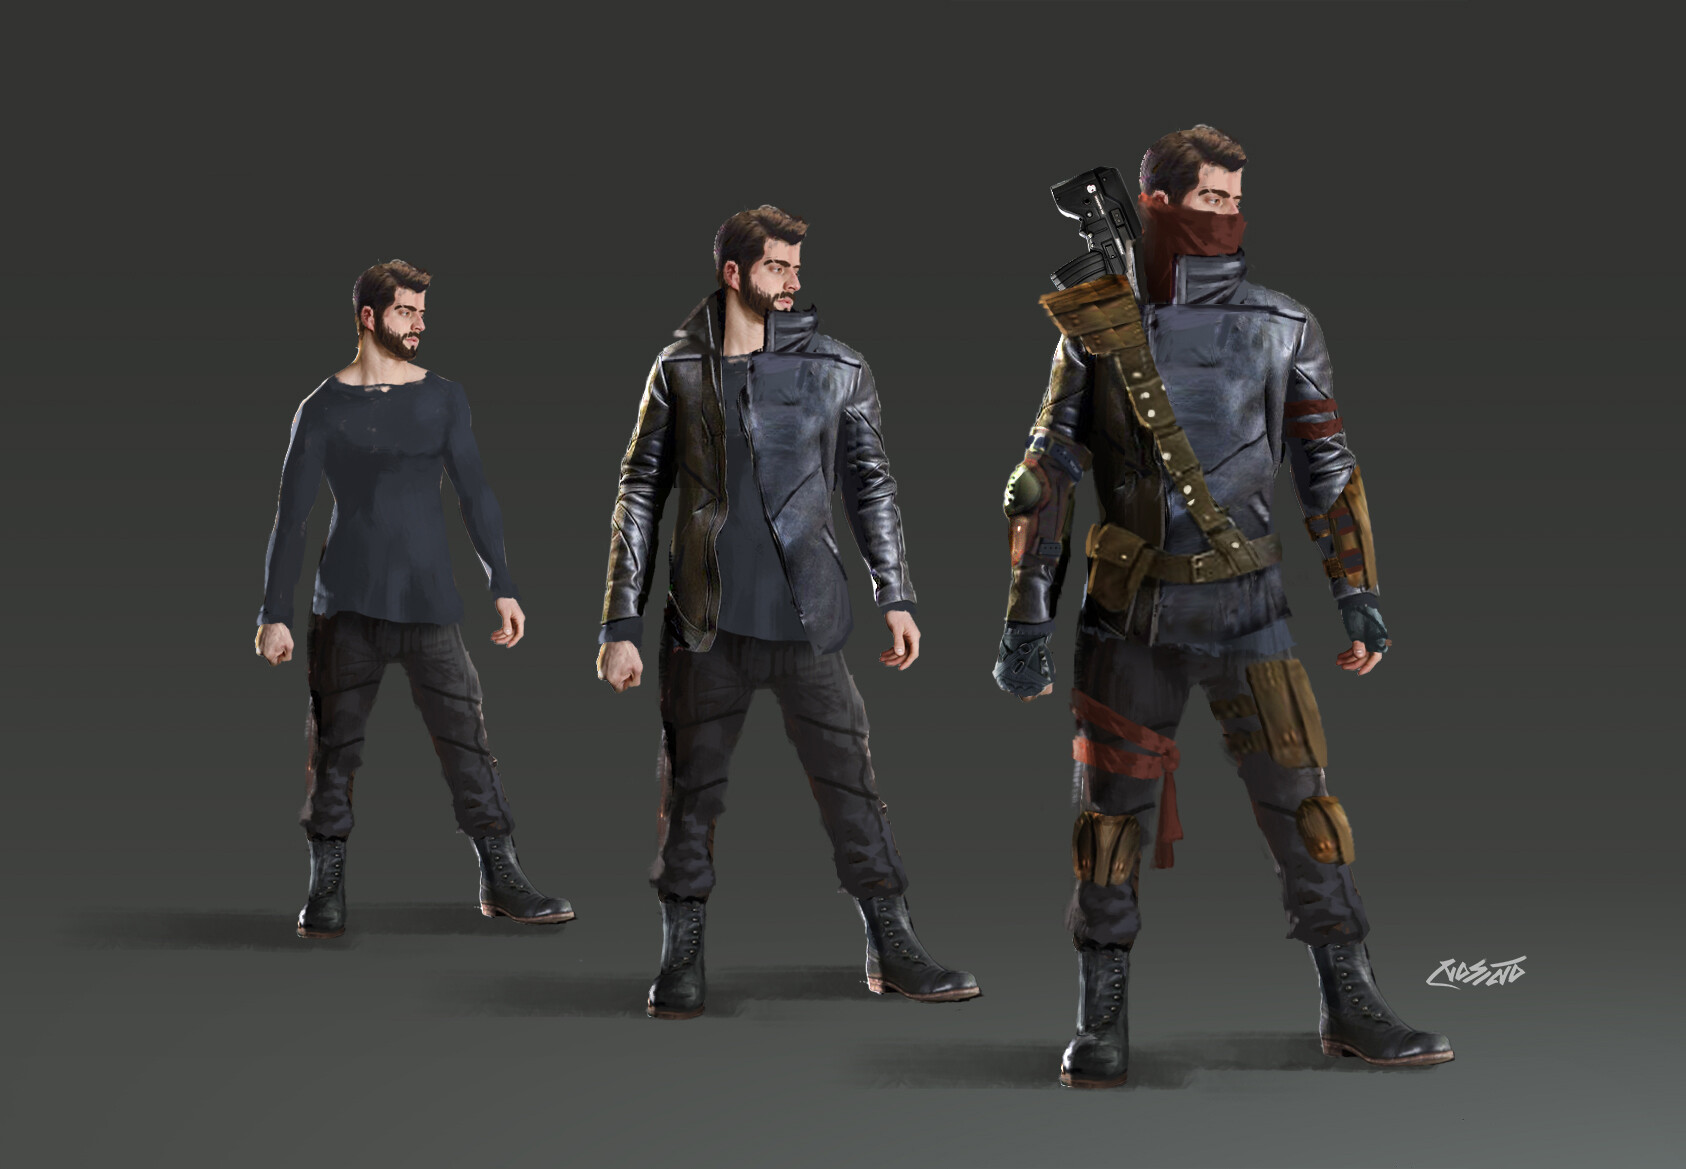 Mohammx essam character raven draft 01